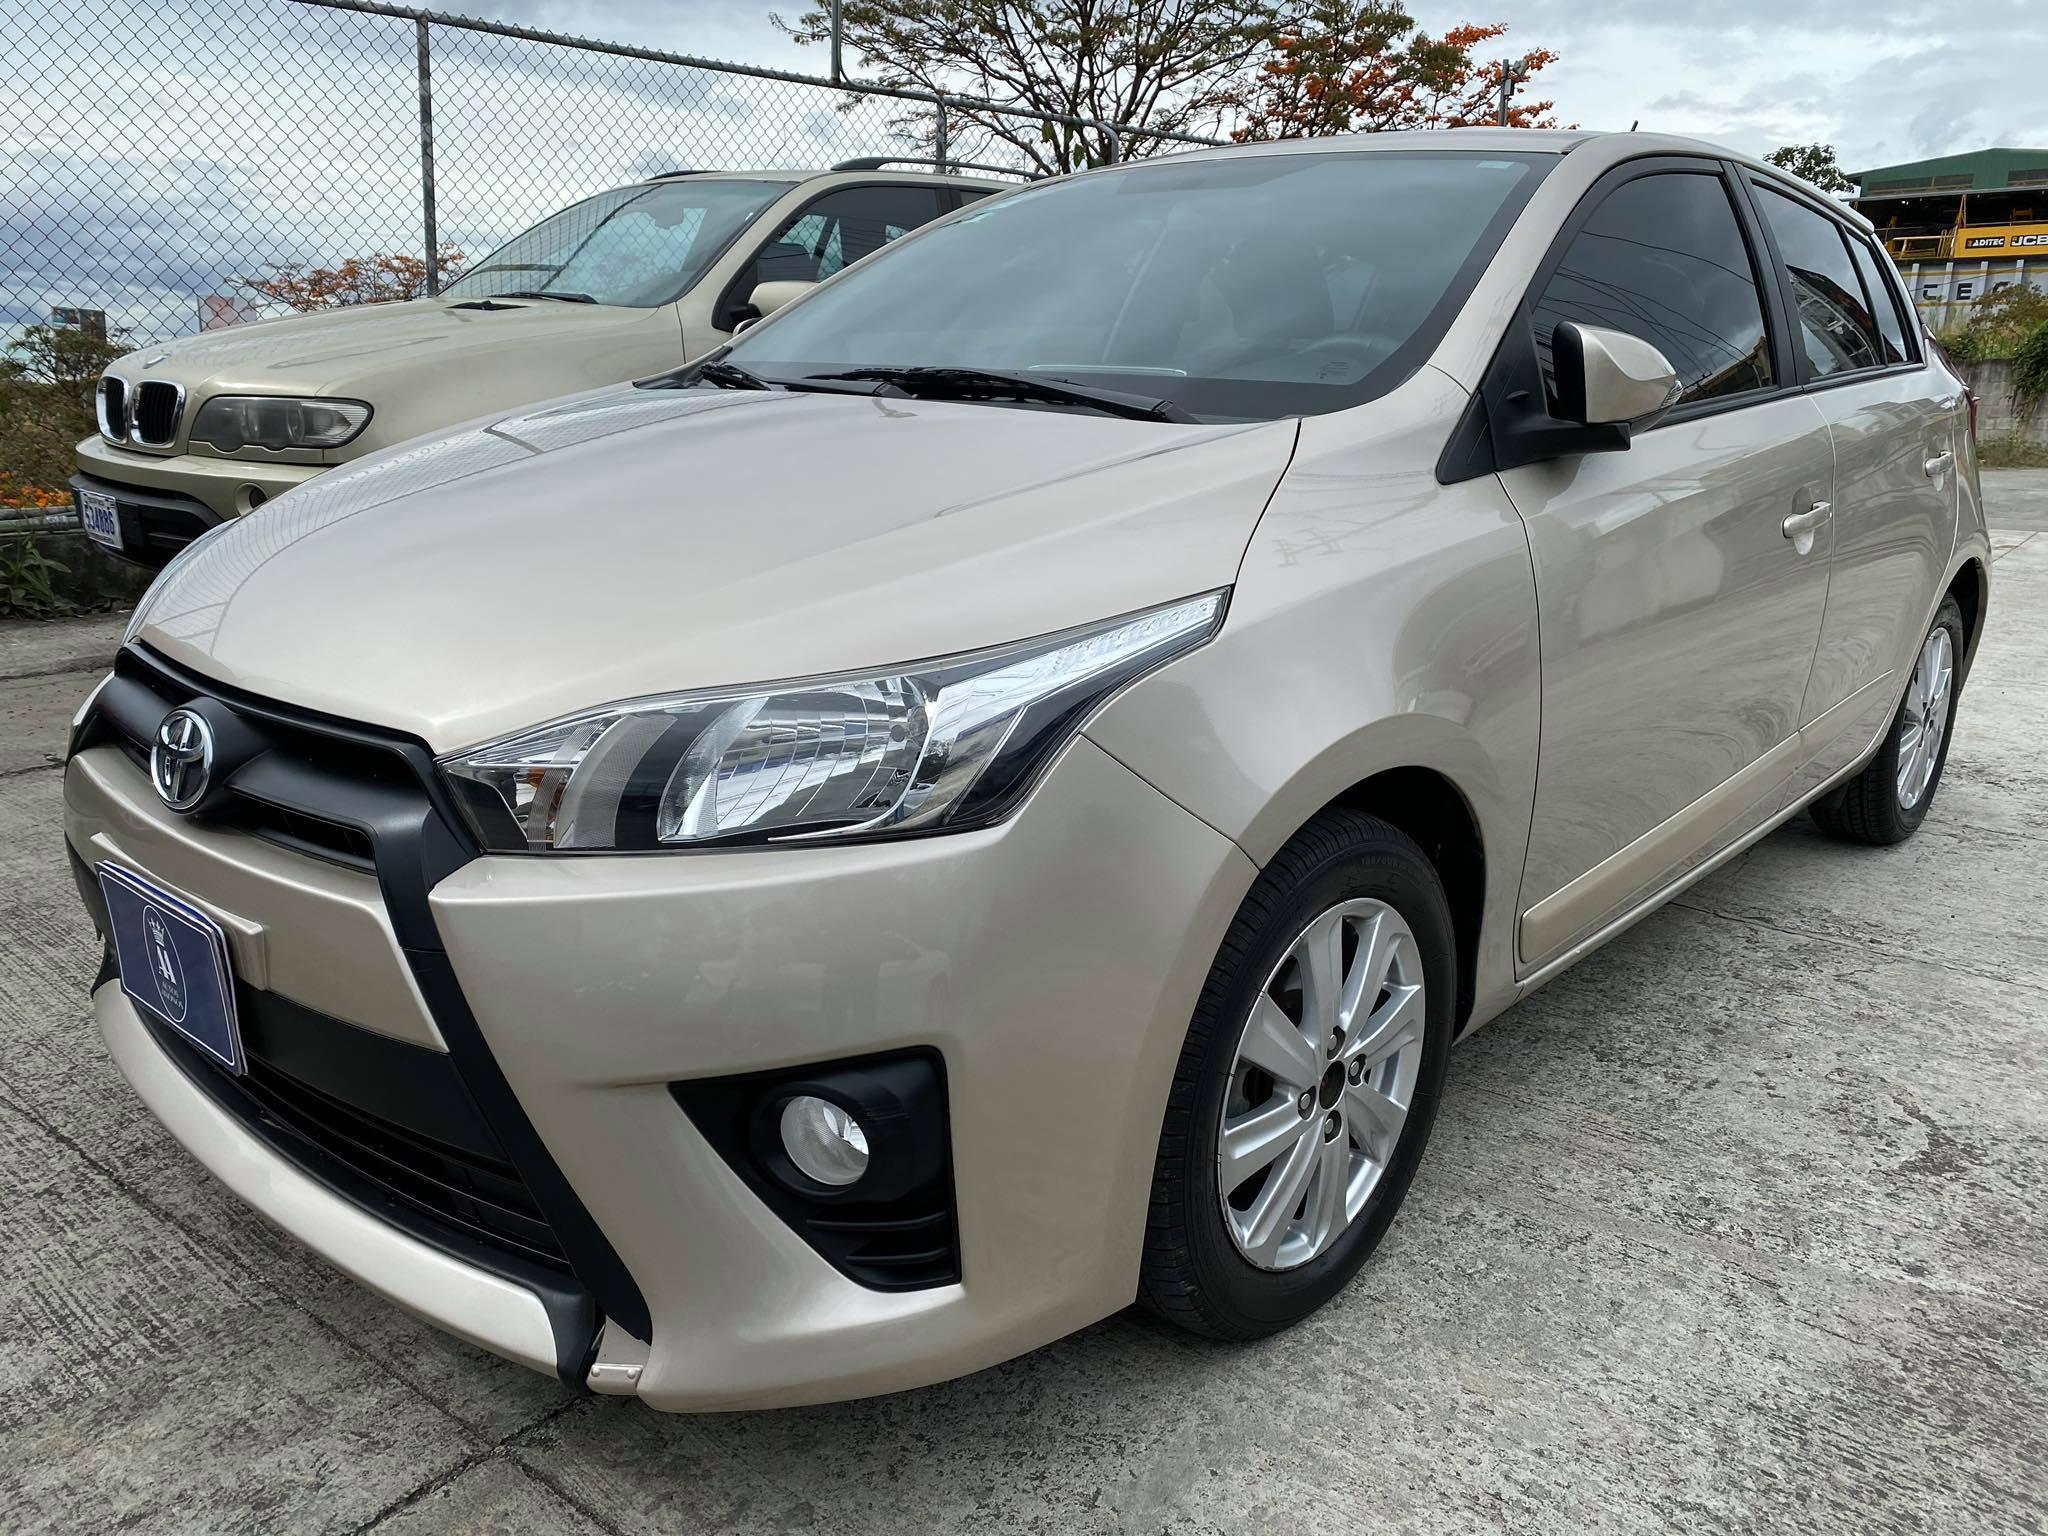 Toyota Yaris S Hatchback